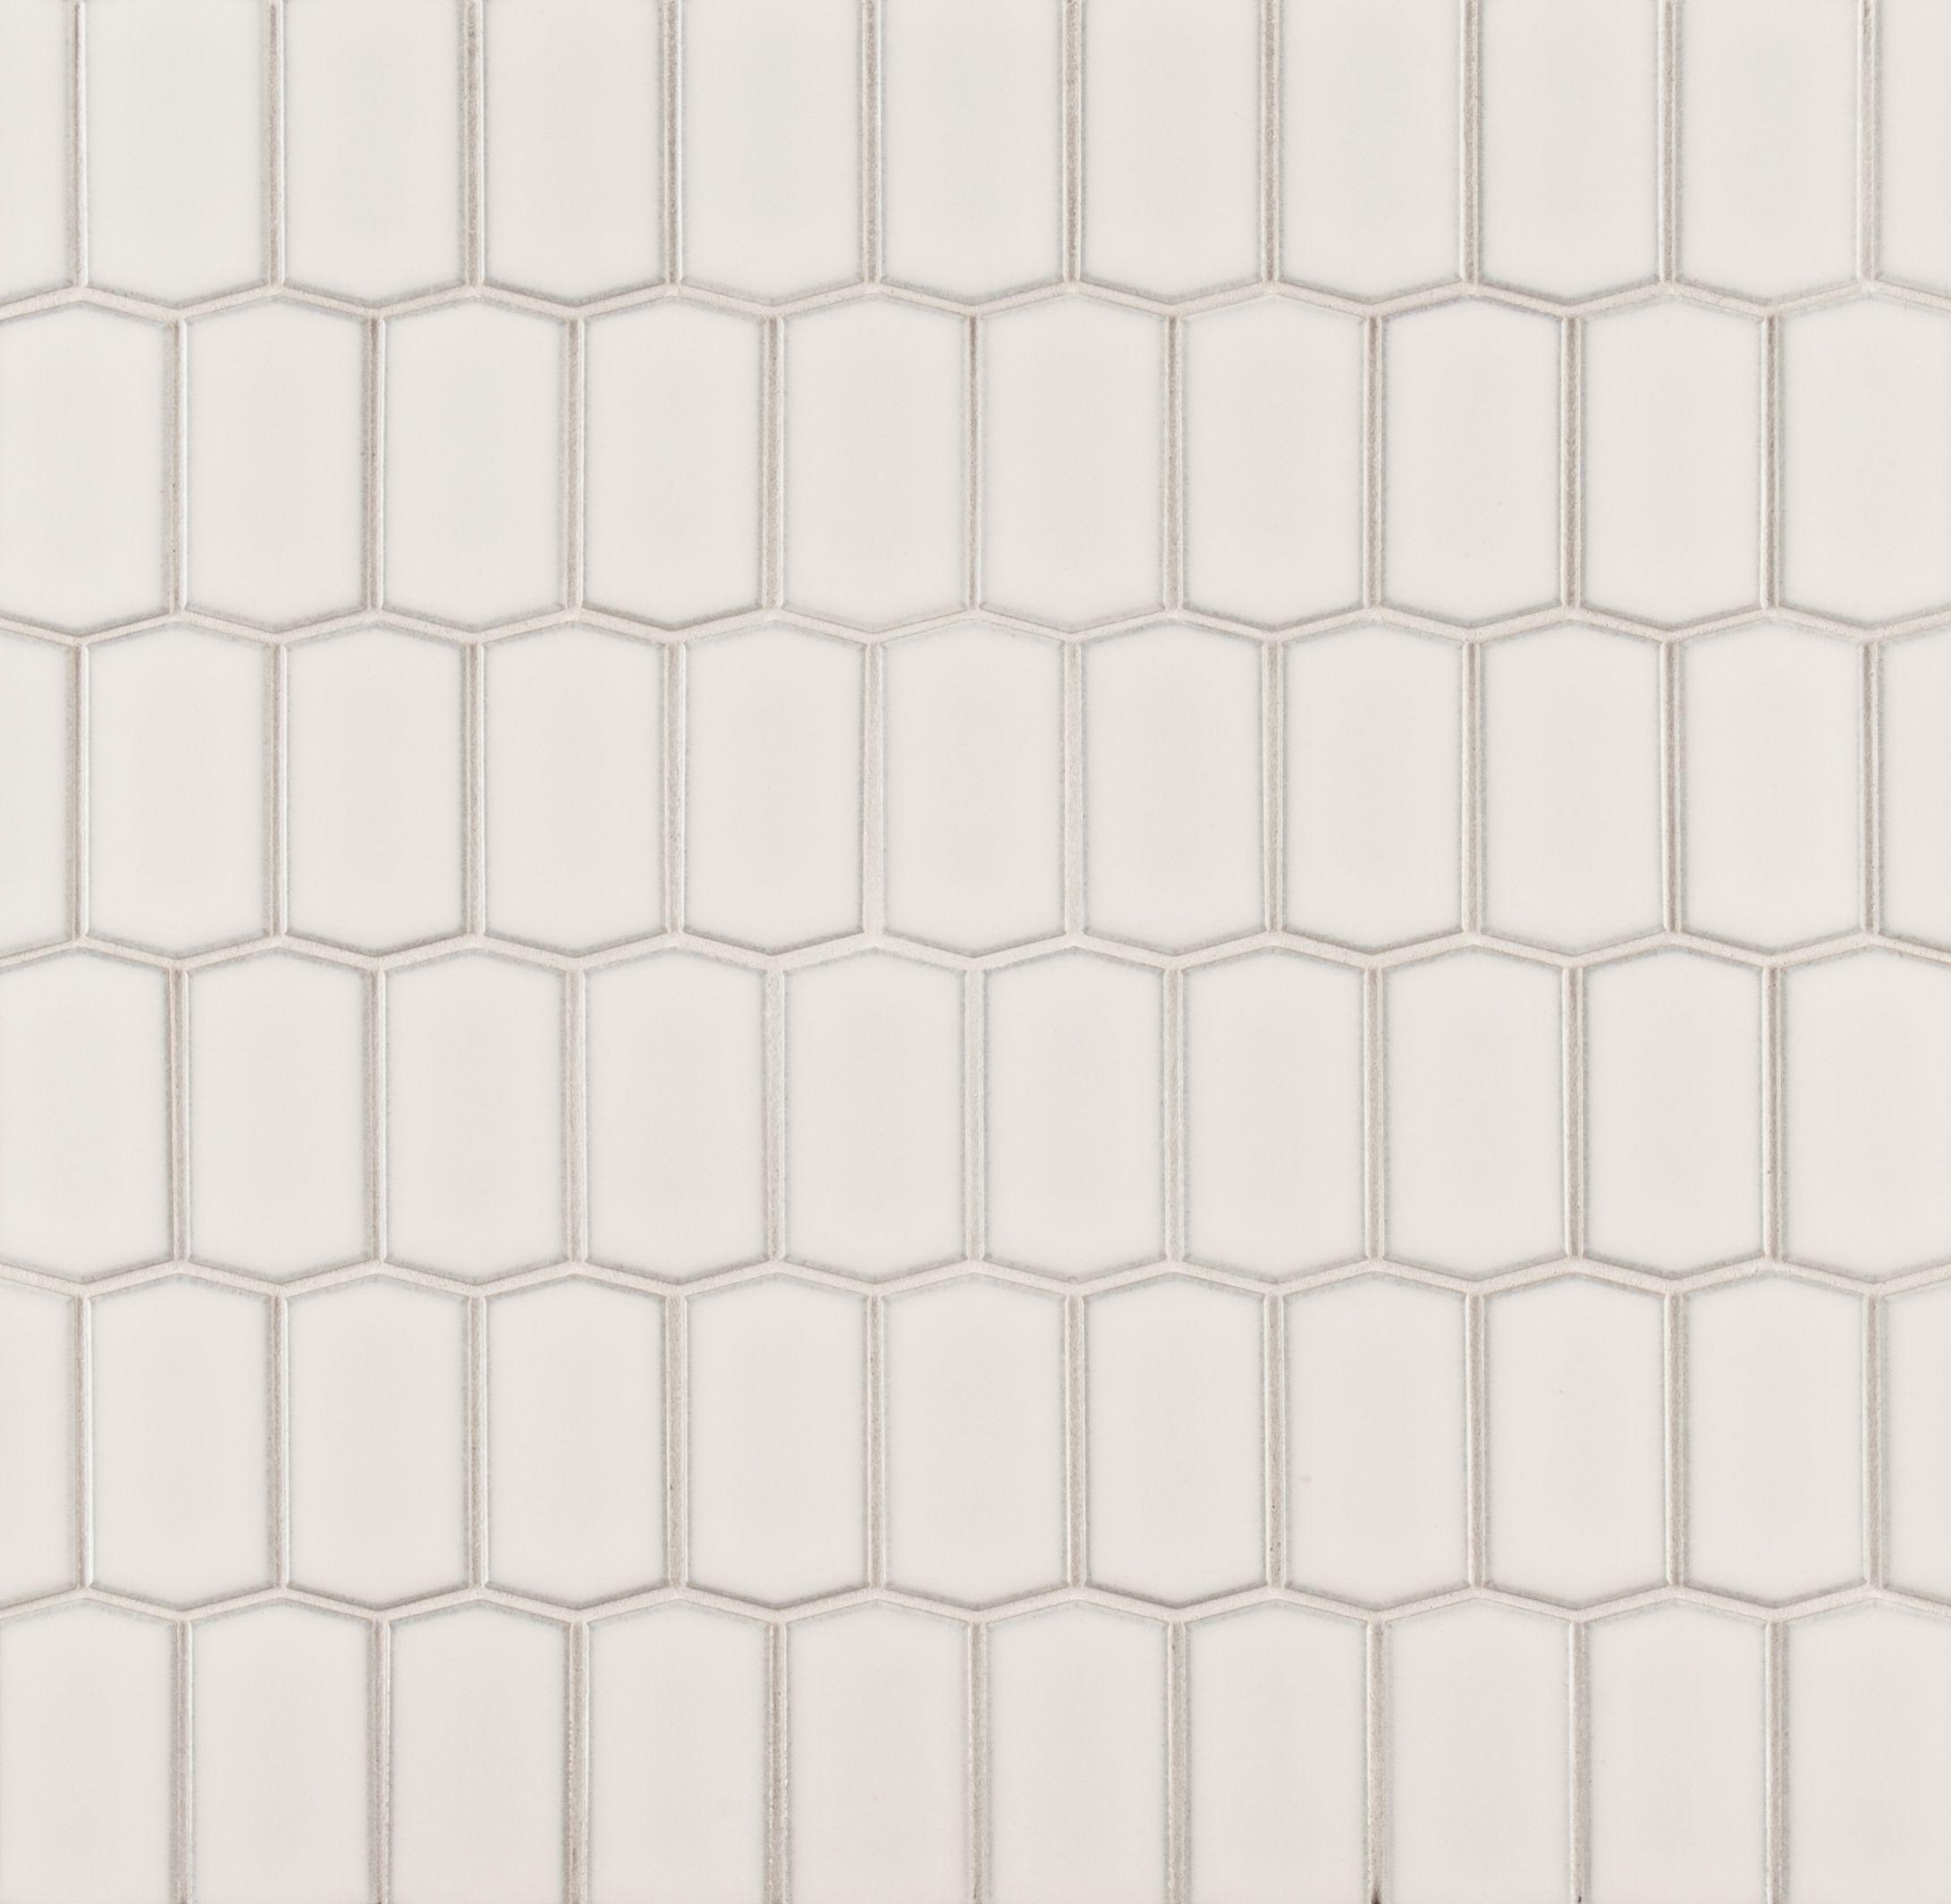 Ann Sacks Mosaic Bathroom Tile: ANN SACKS Savoy Hive Ceramic Mosaic In Ricepaper Let's Do